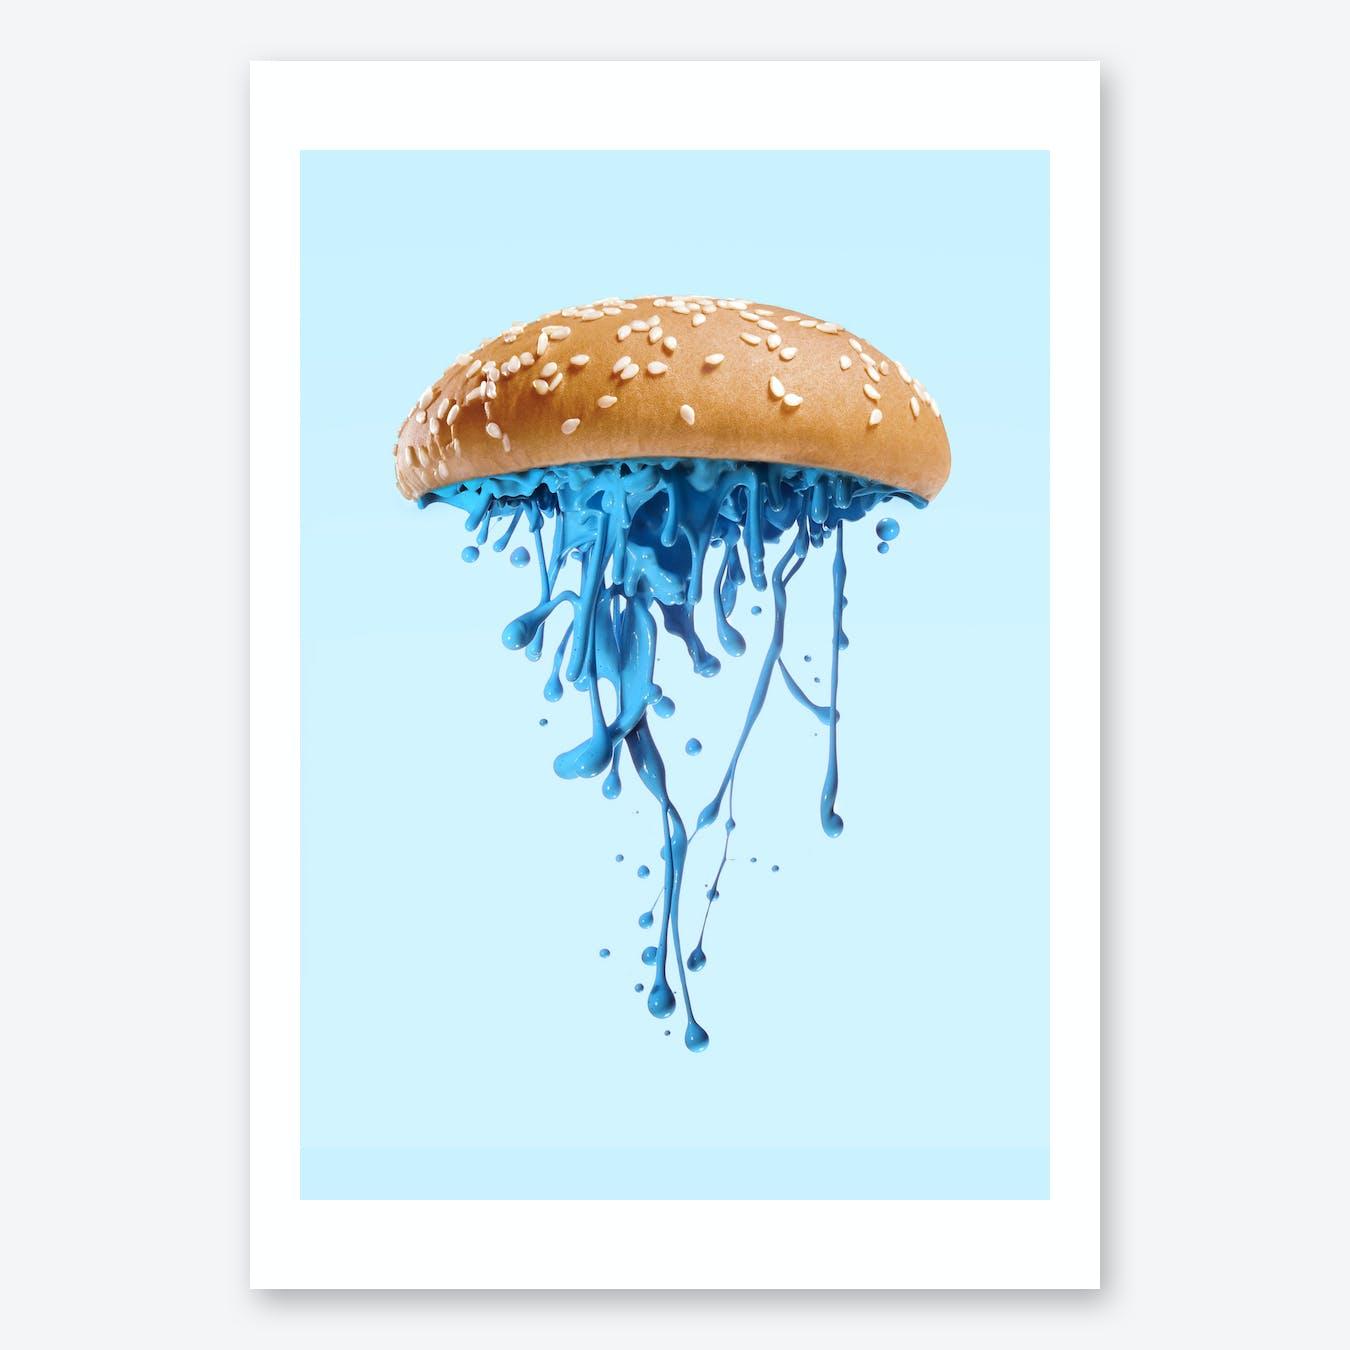 Jellyburger Print